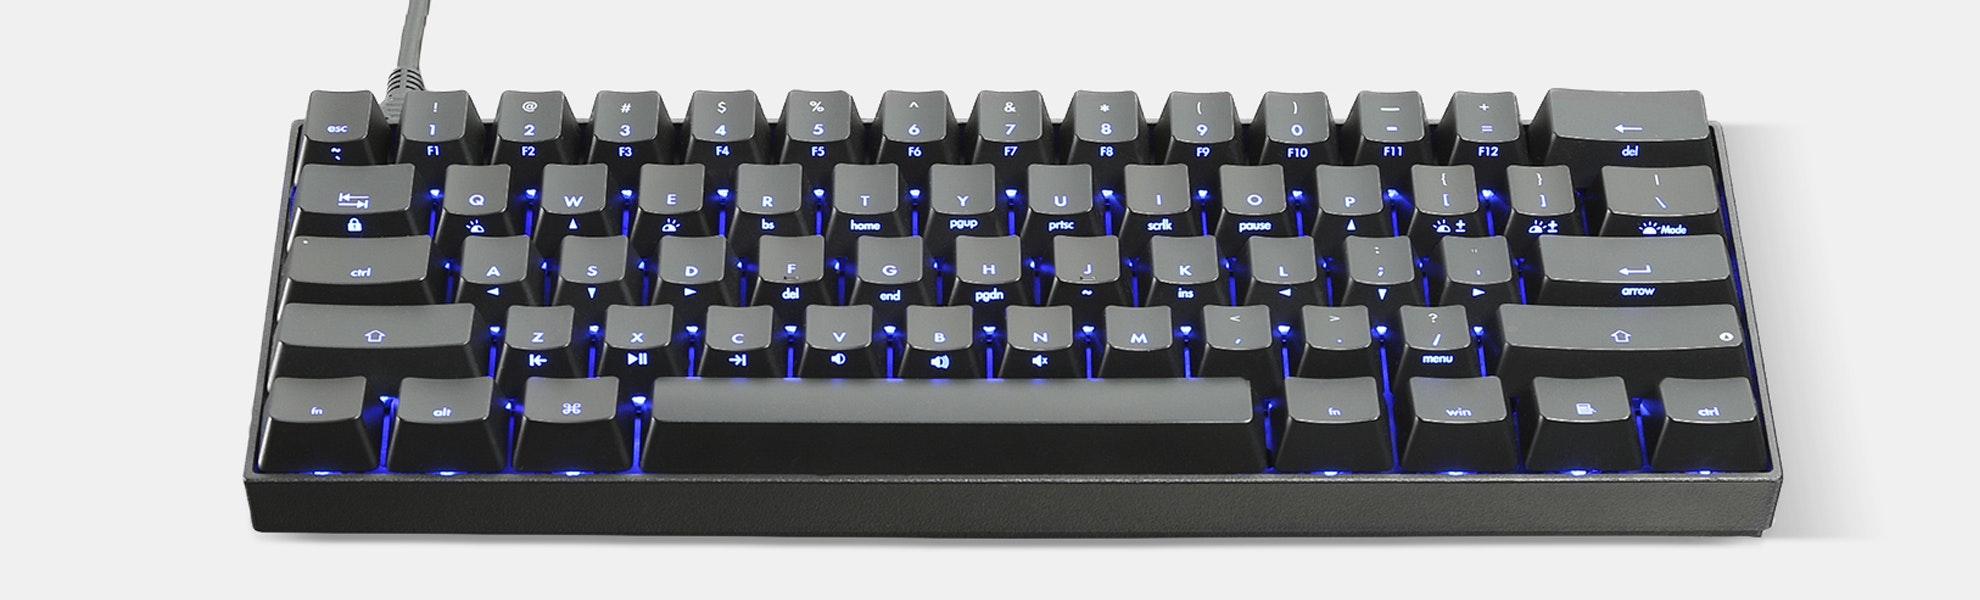 KBParadise V60 Plus Mini Mechanical Keyboard